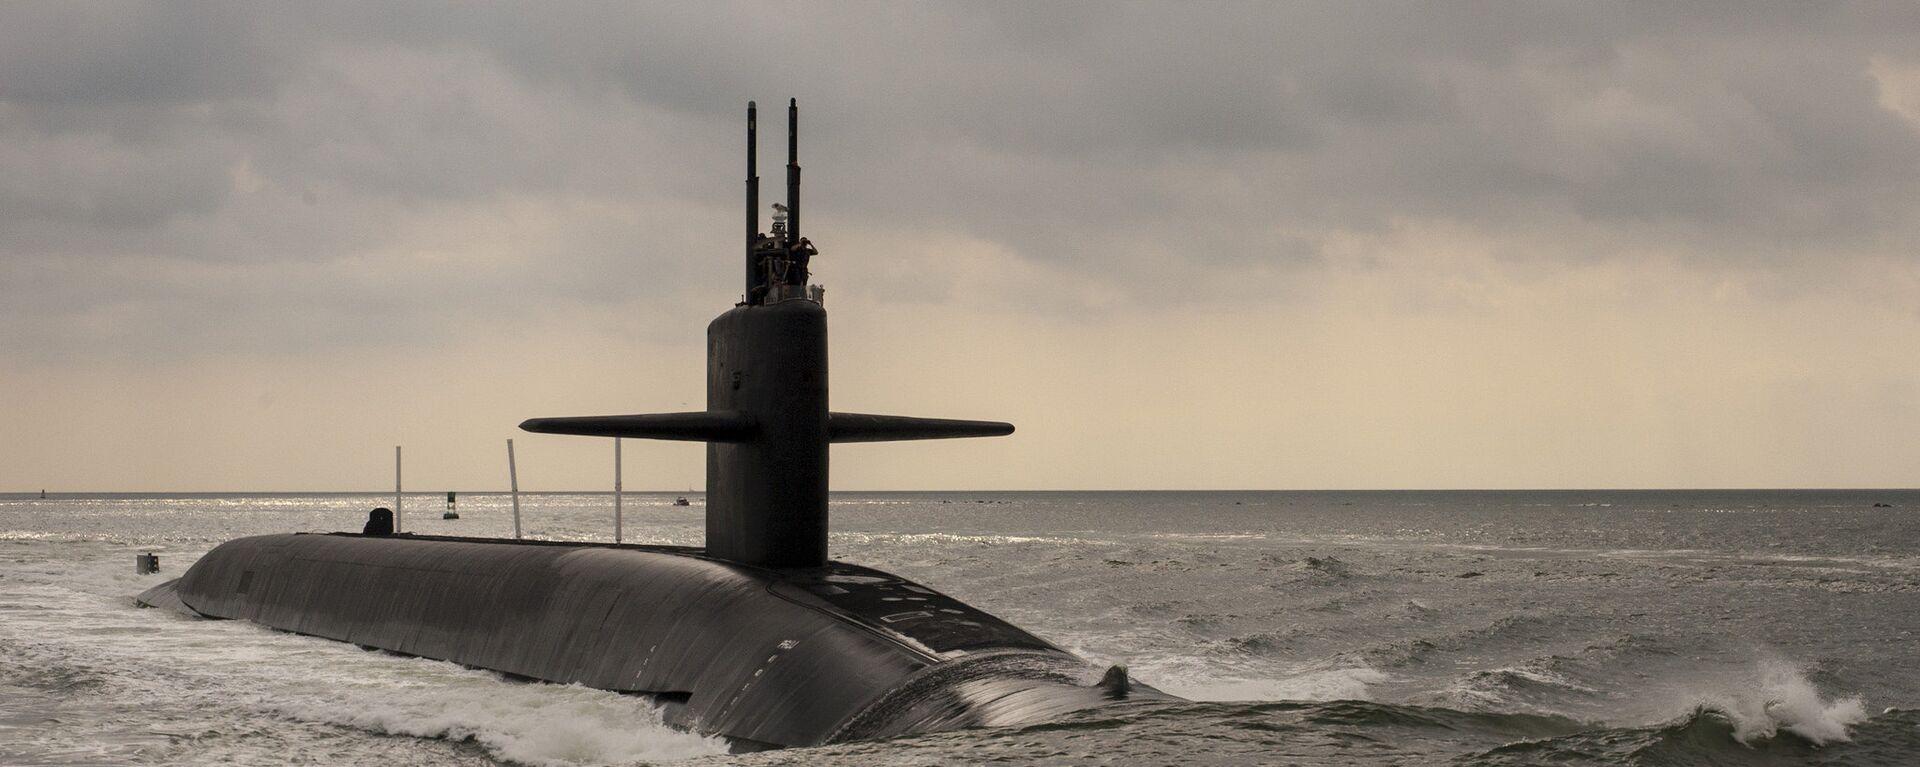 Sottomarino nucleare USA di classe Ohio  - Sputnik Italia, 1920, 04.06.2021